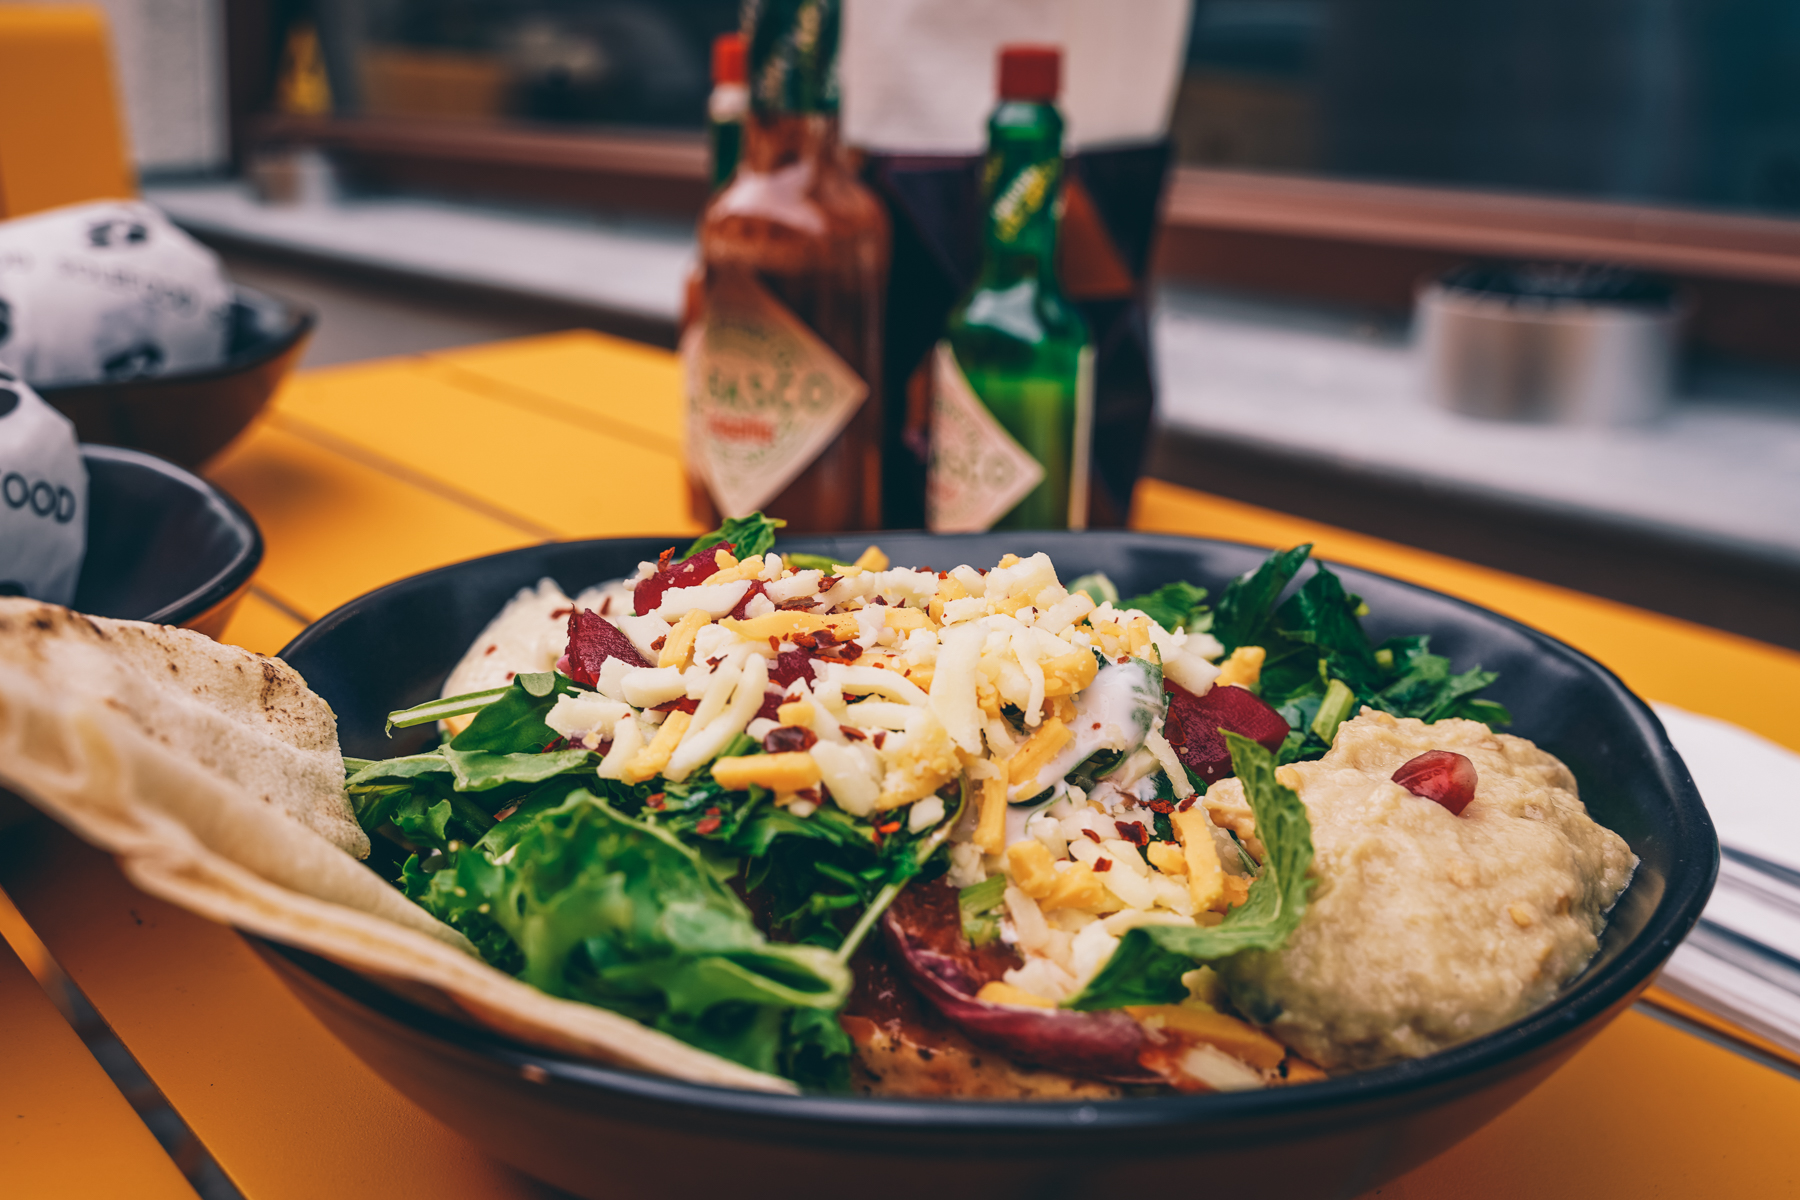 Egal ob Arrabito oder Bowl: Bei Solefood ist alles vegetarisch. – ©wunderland media GmbH